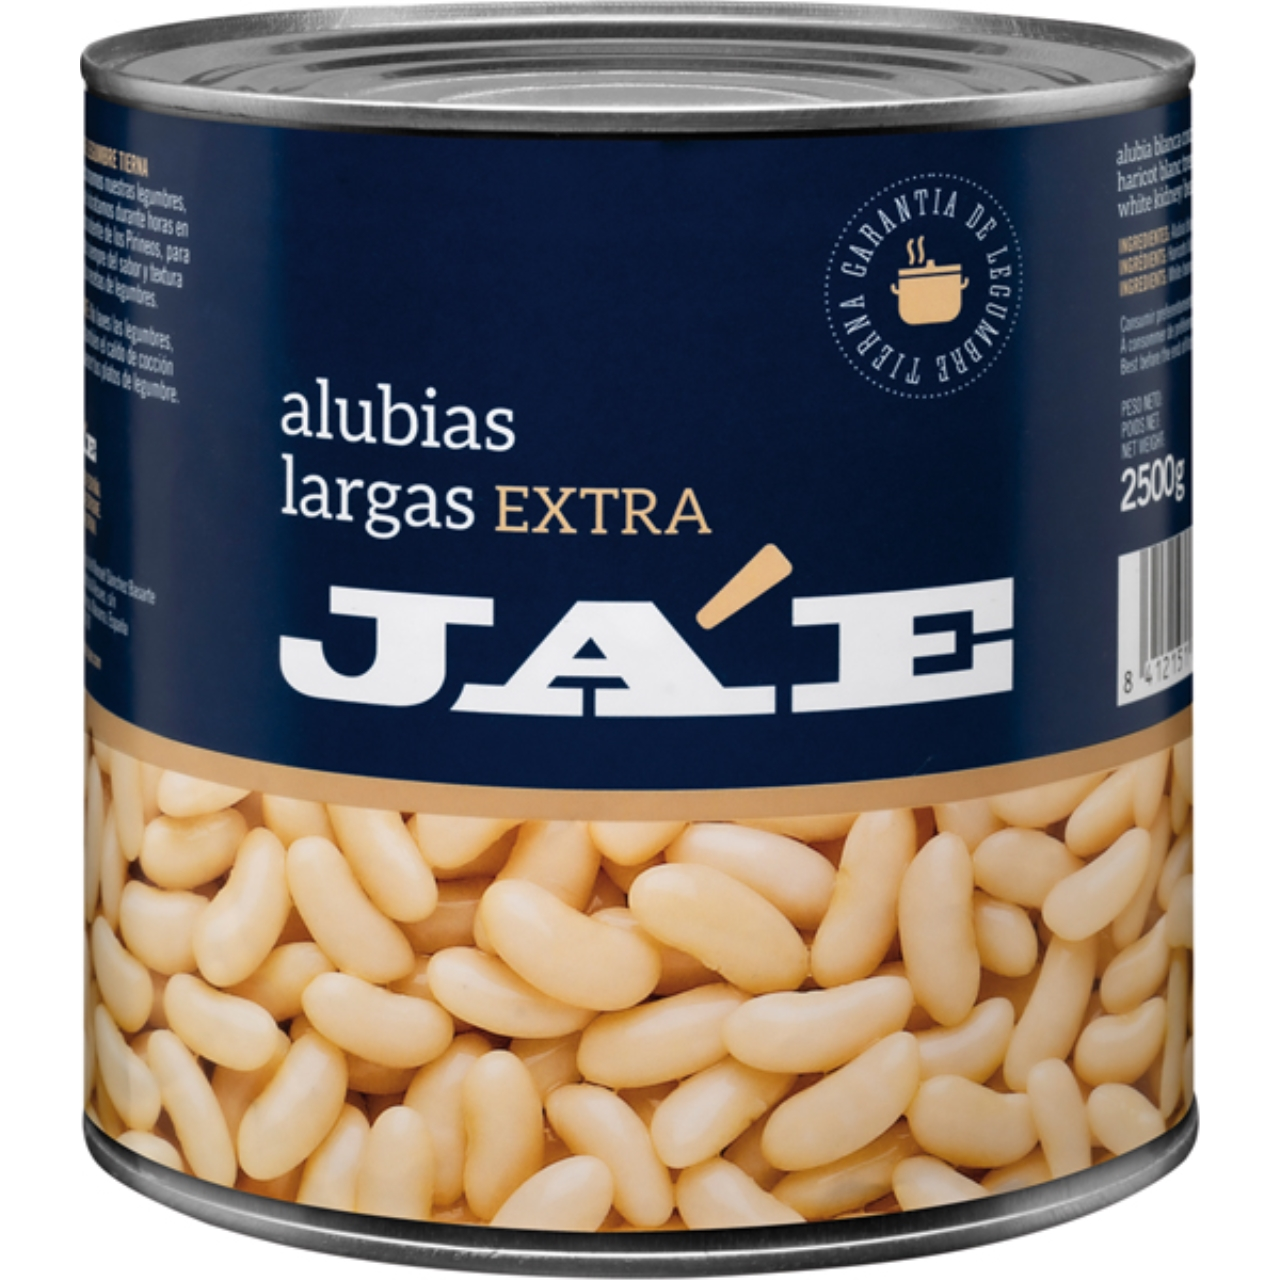 Judía larga blanca cocida extra 3kg. Ja'E